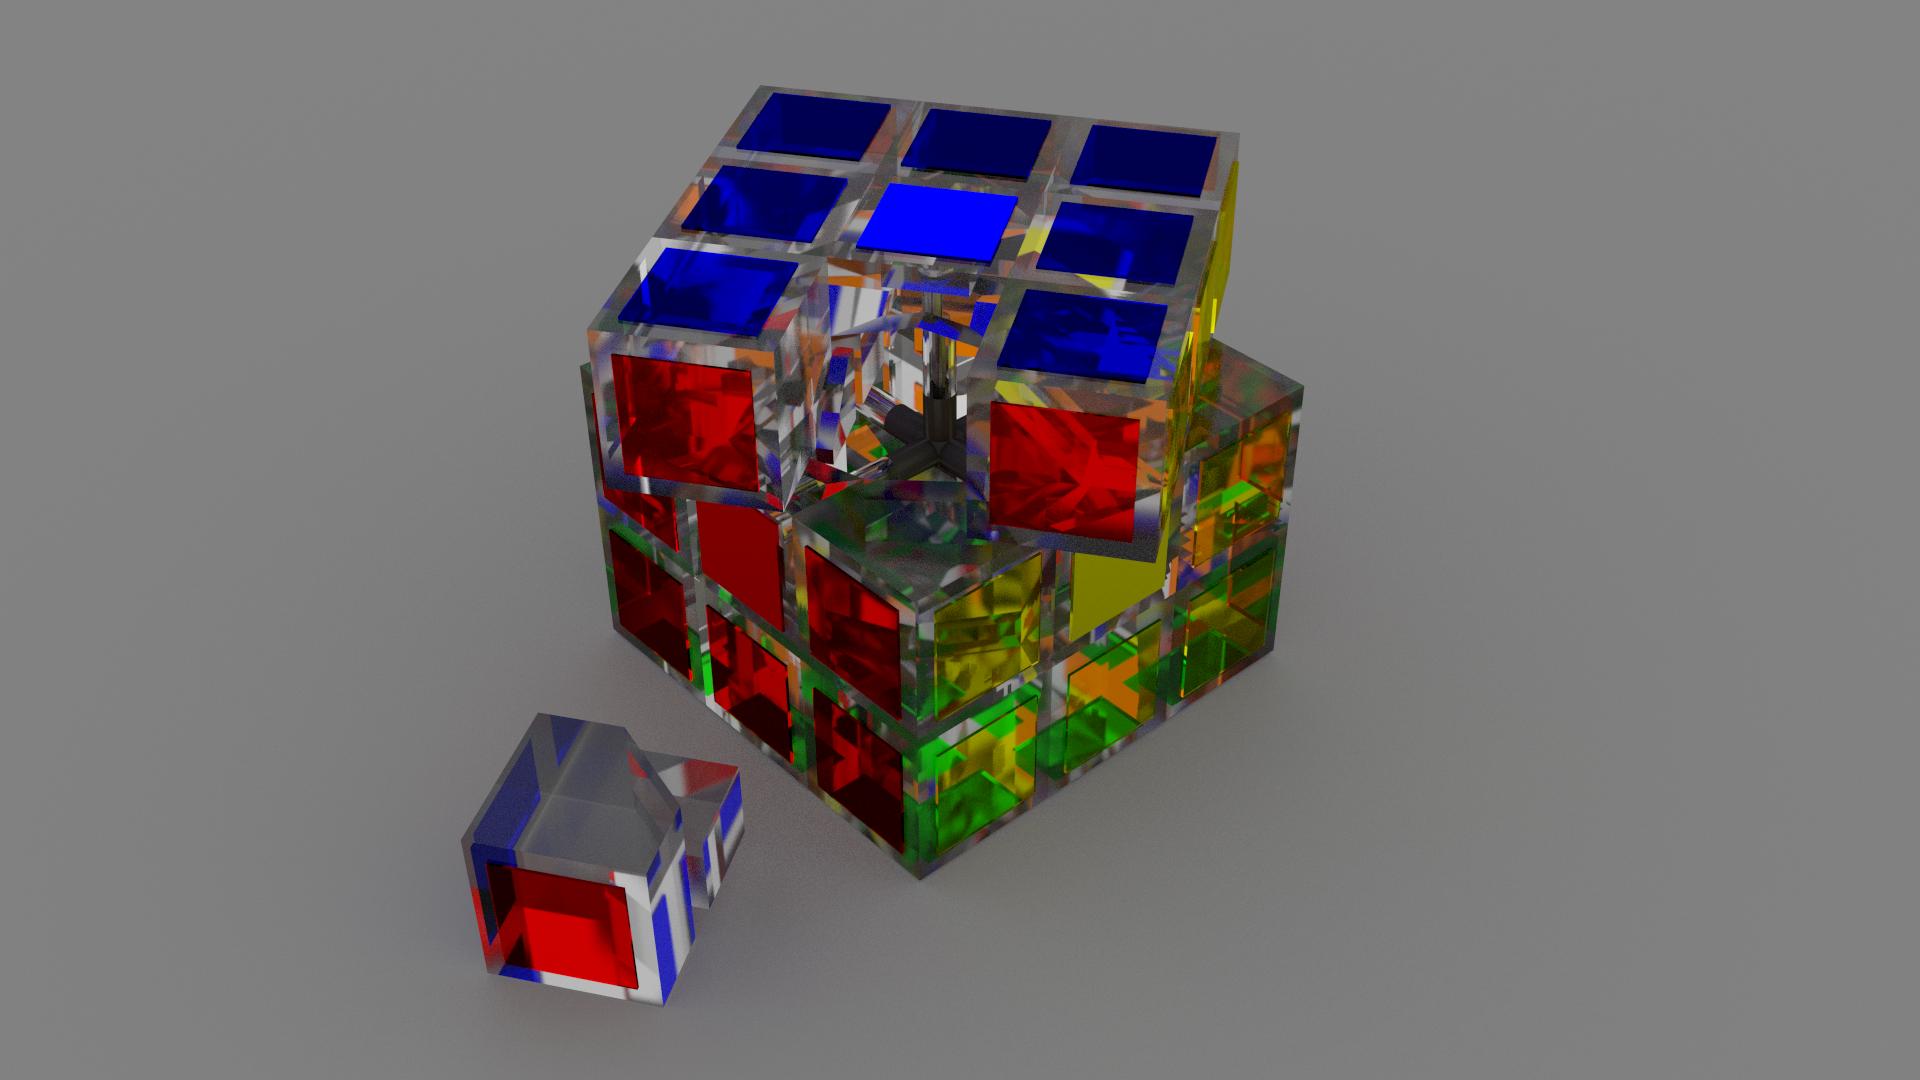 Full Glass Rubik's Cube by adriens33